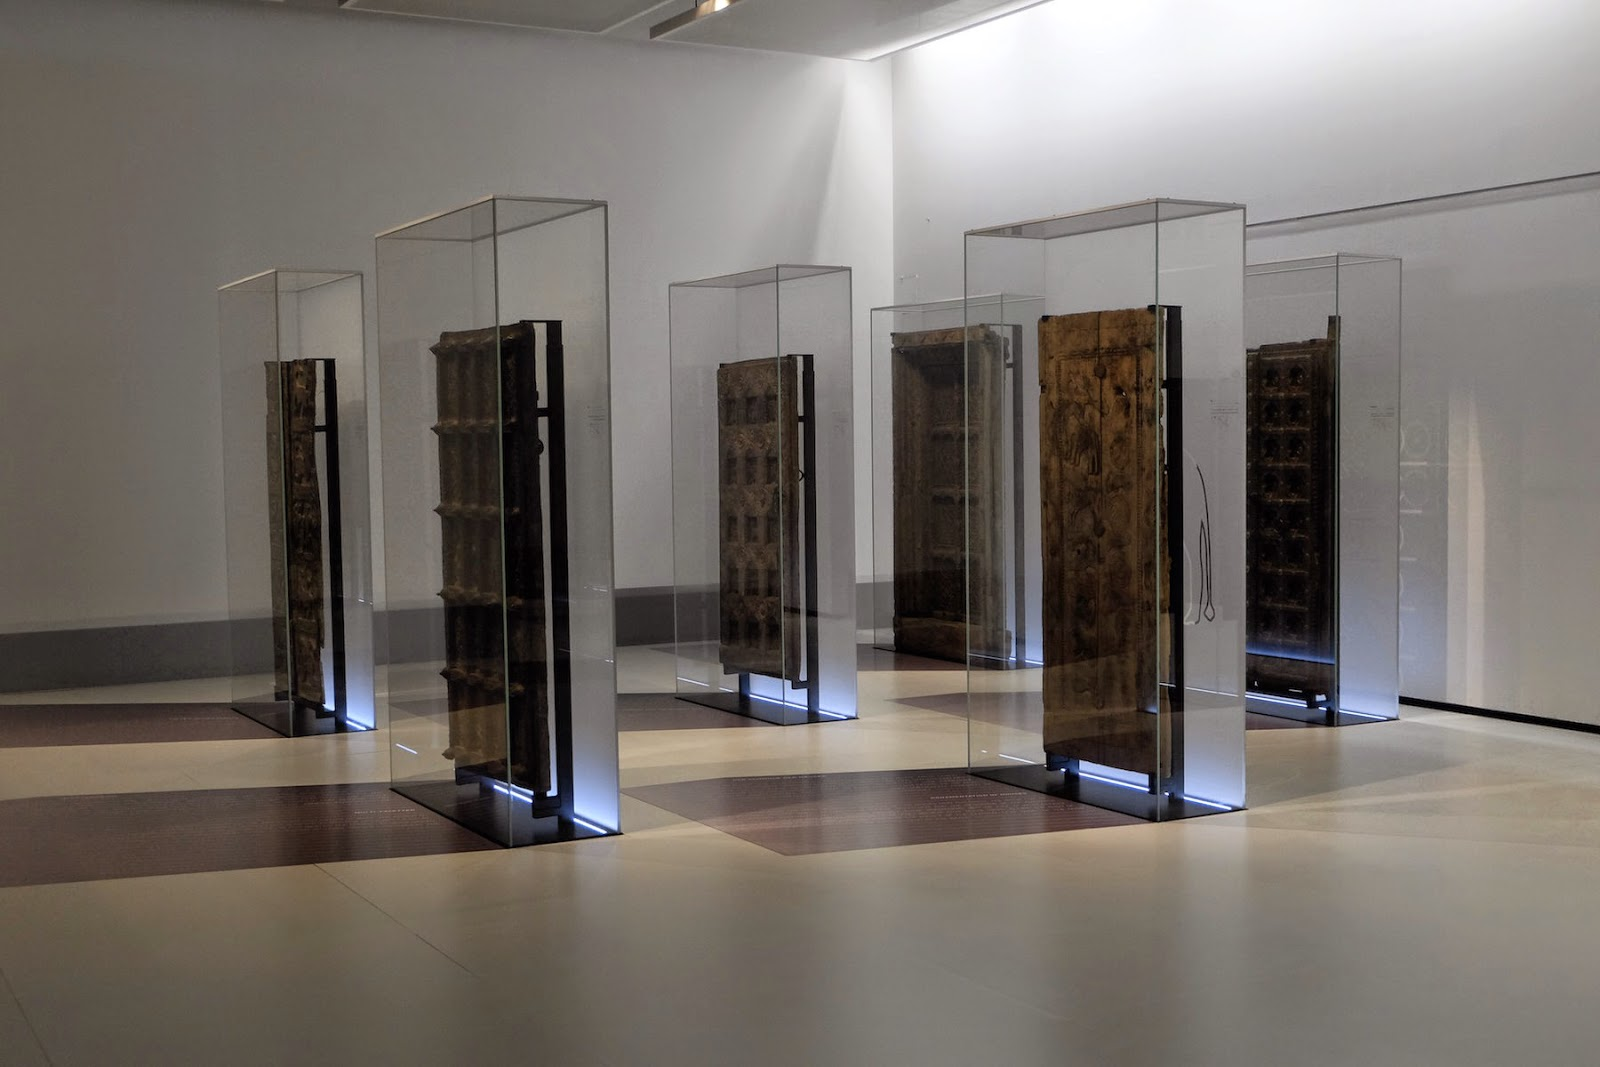 museum on display rautenstrauch joest museum k ln. Black Bedroom Furniture Sets. Home Design Ideas